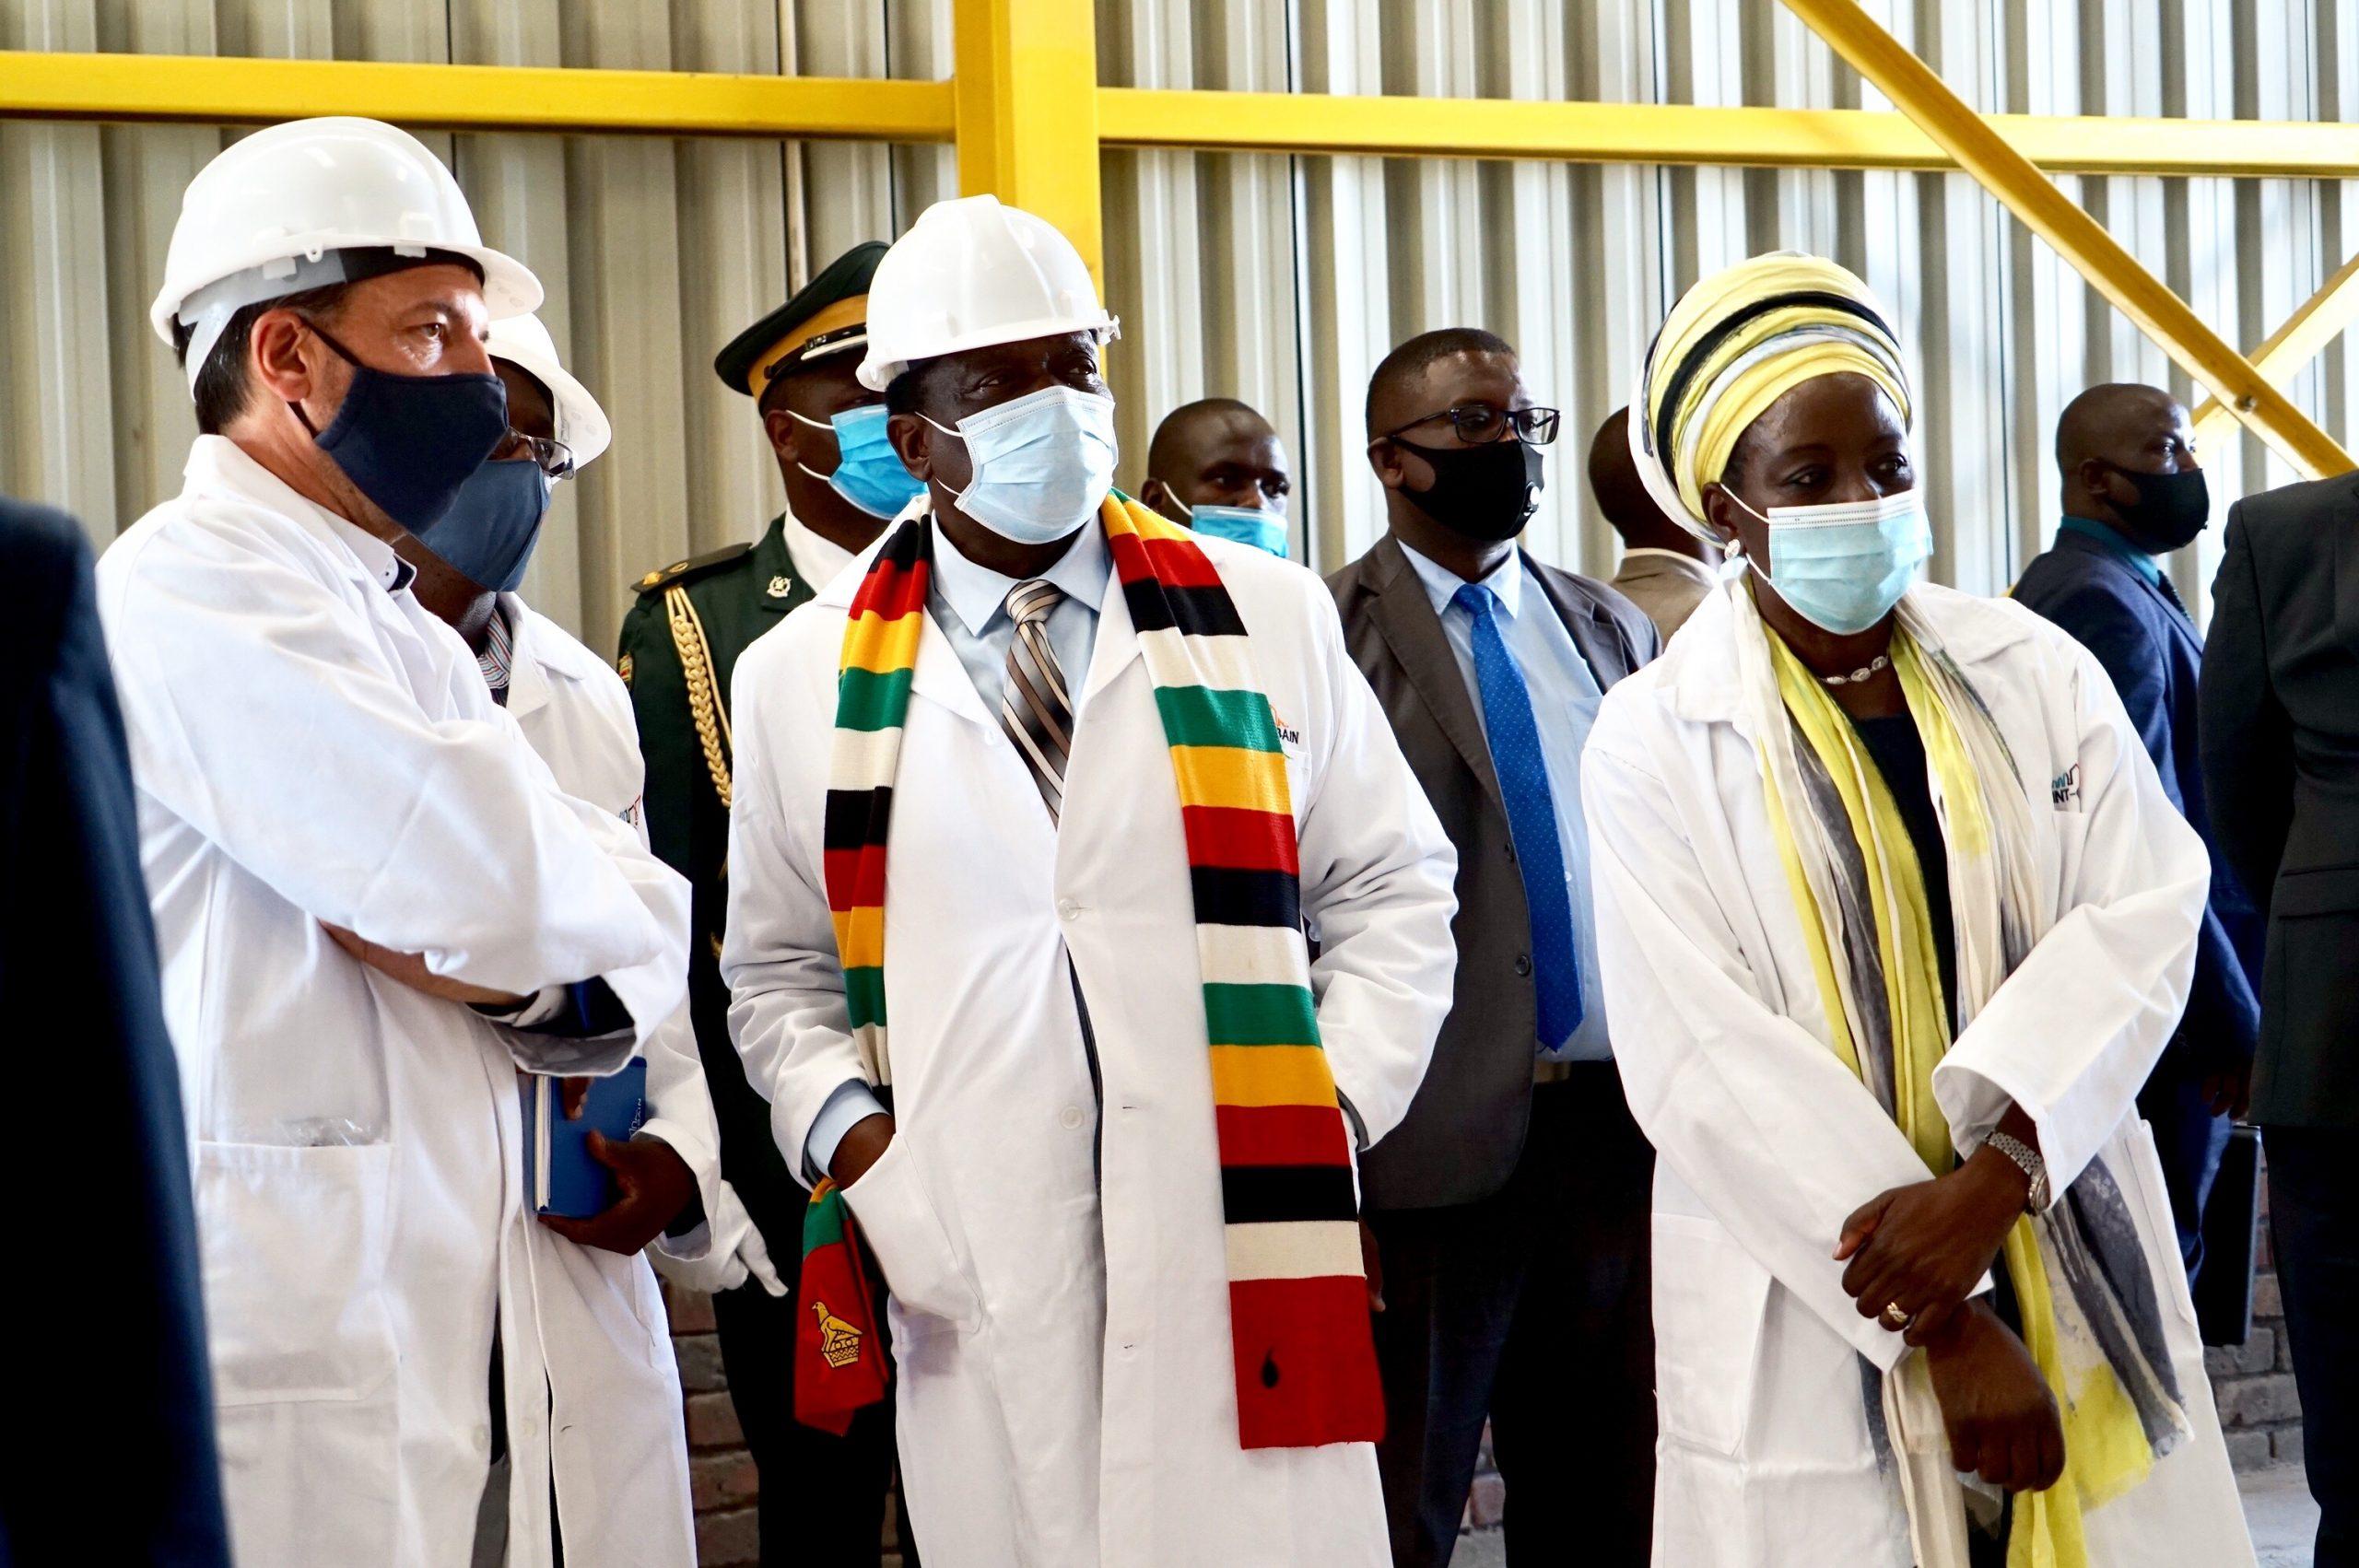 Zim's Exports To Grow To US$7b By 2023 – Mnangagwa